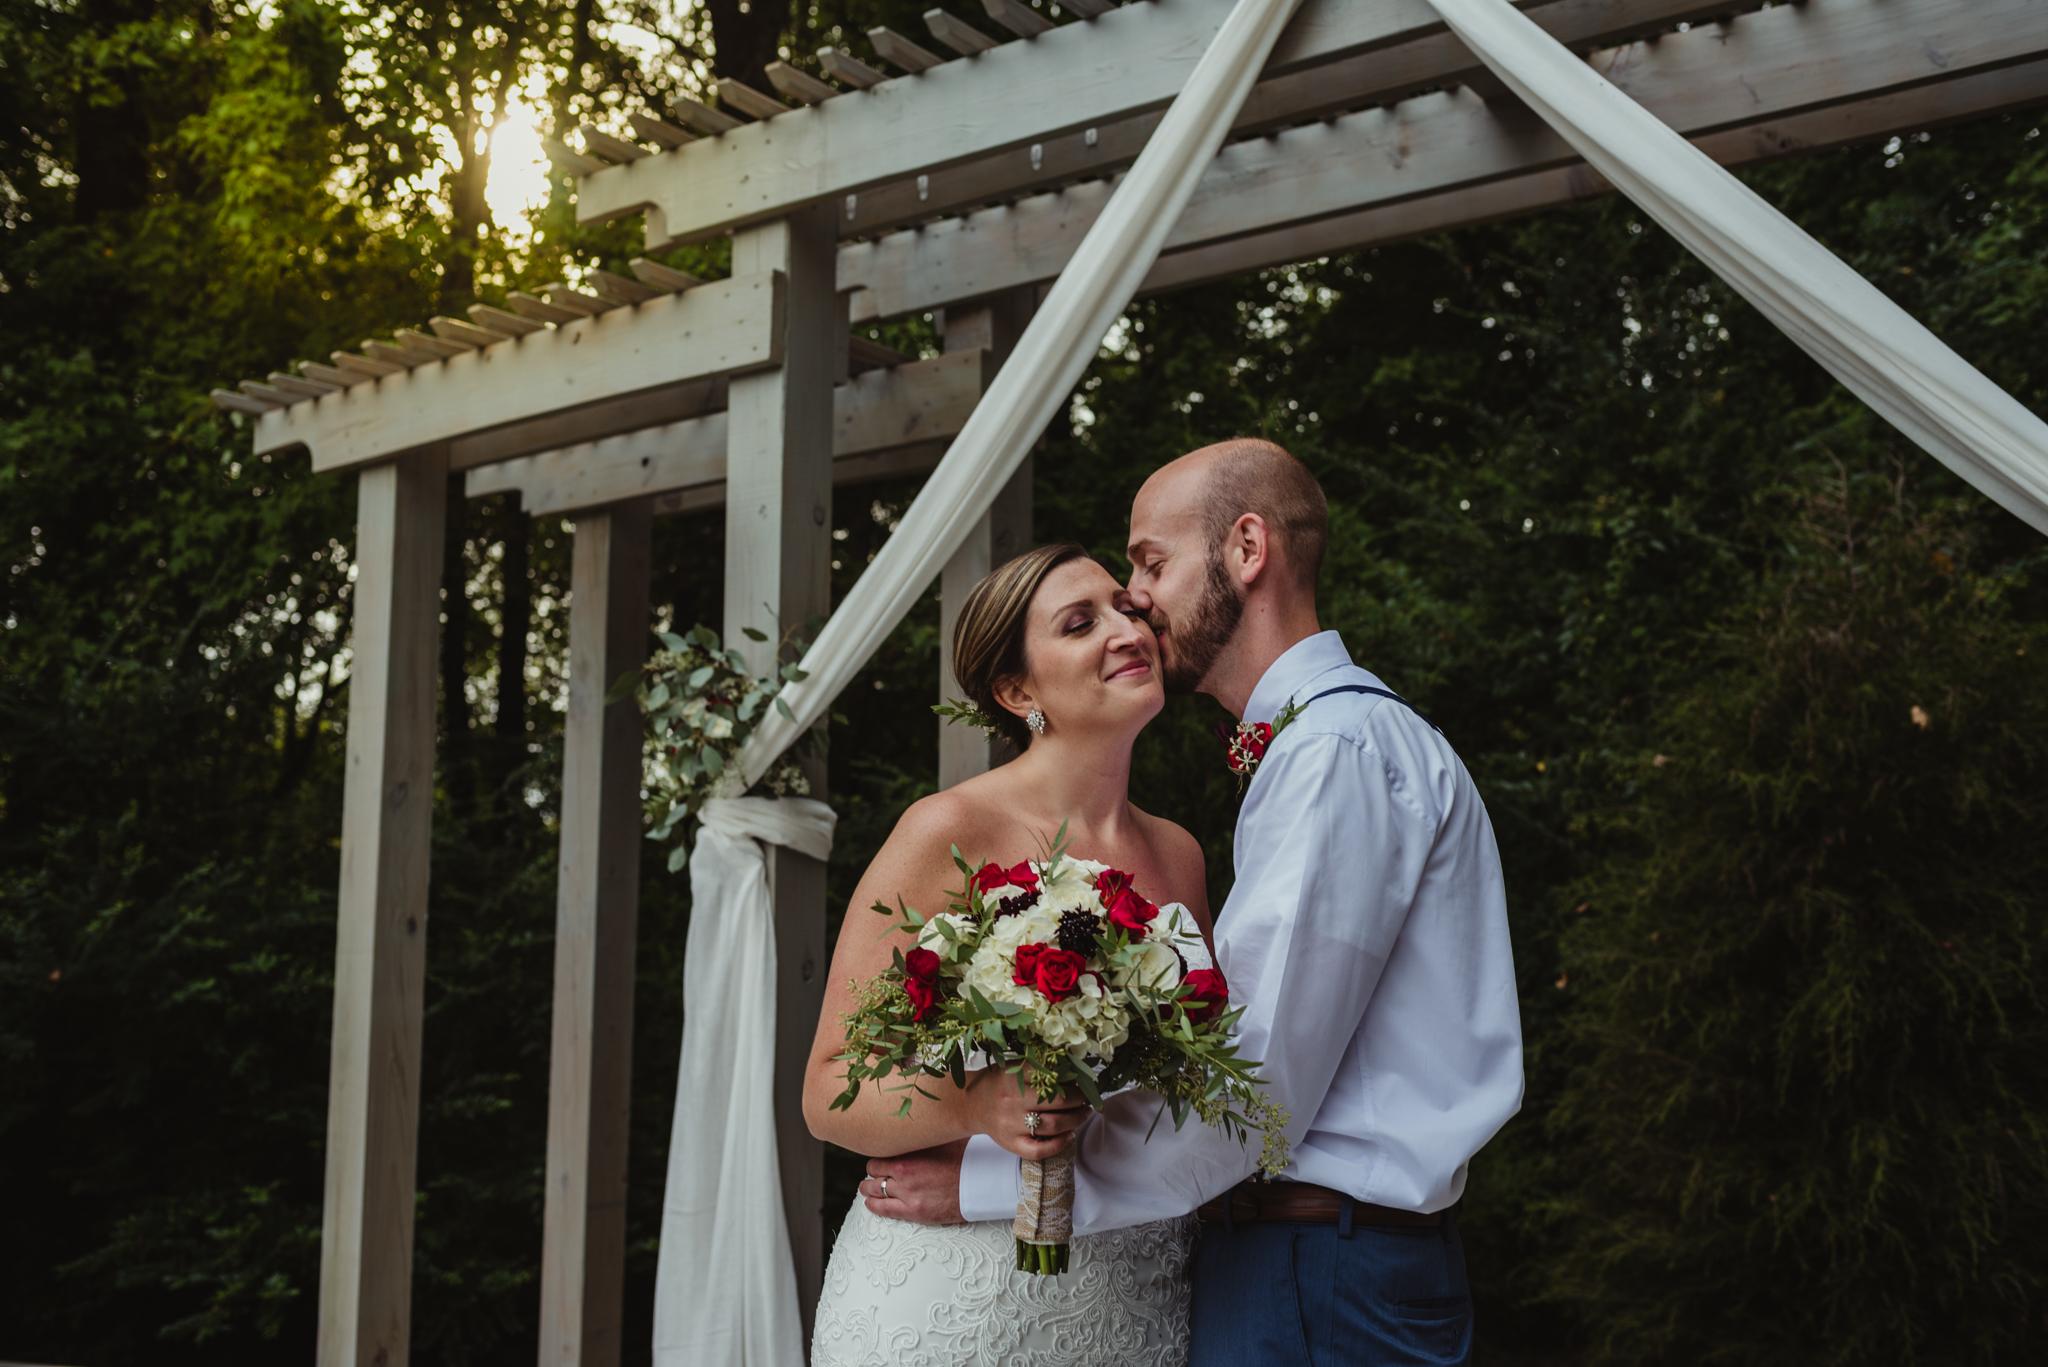 Cedar Grove Acres, Raleigh Wedding Photographer, Katie and Tyler, bride and groom